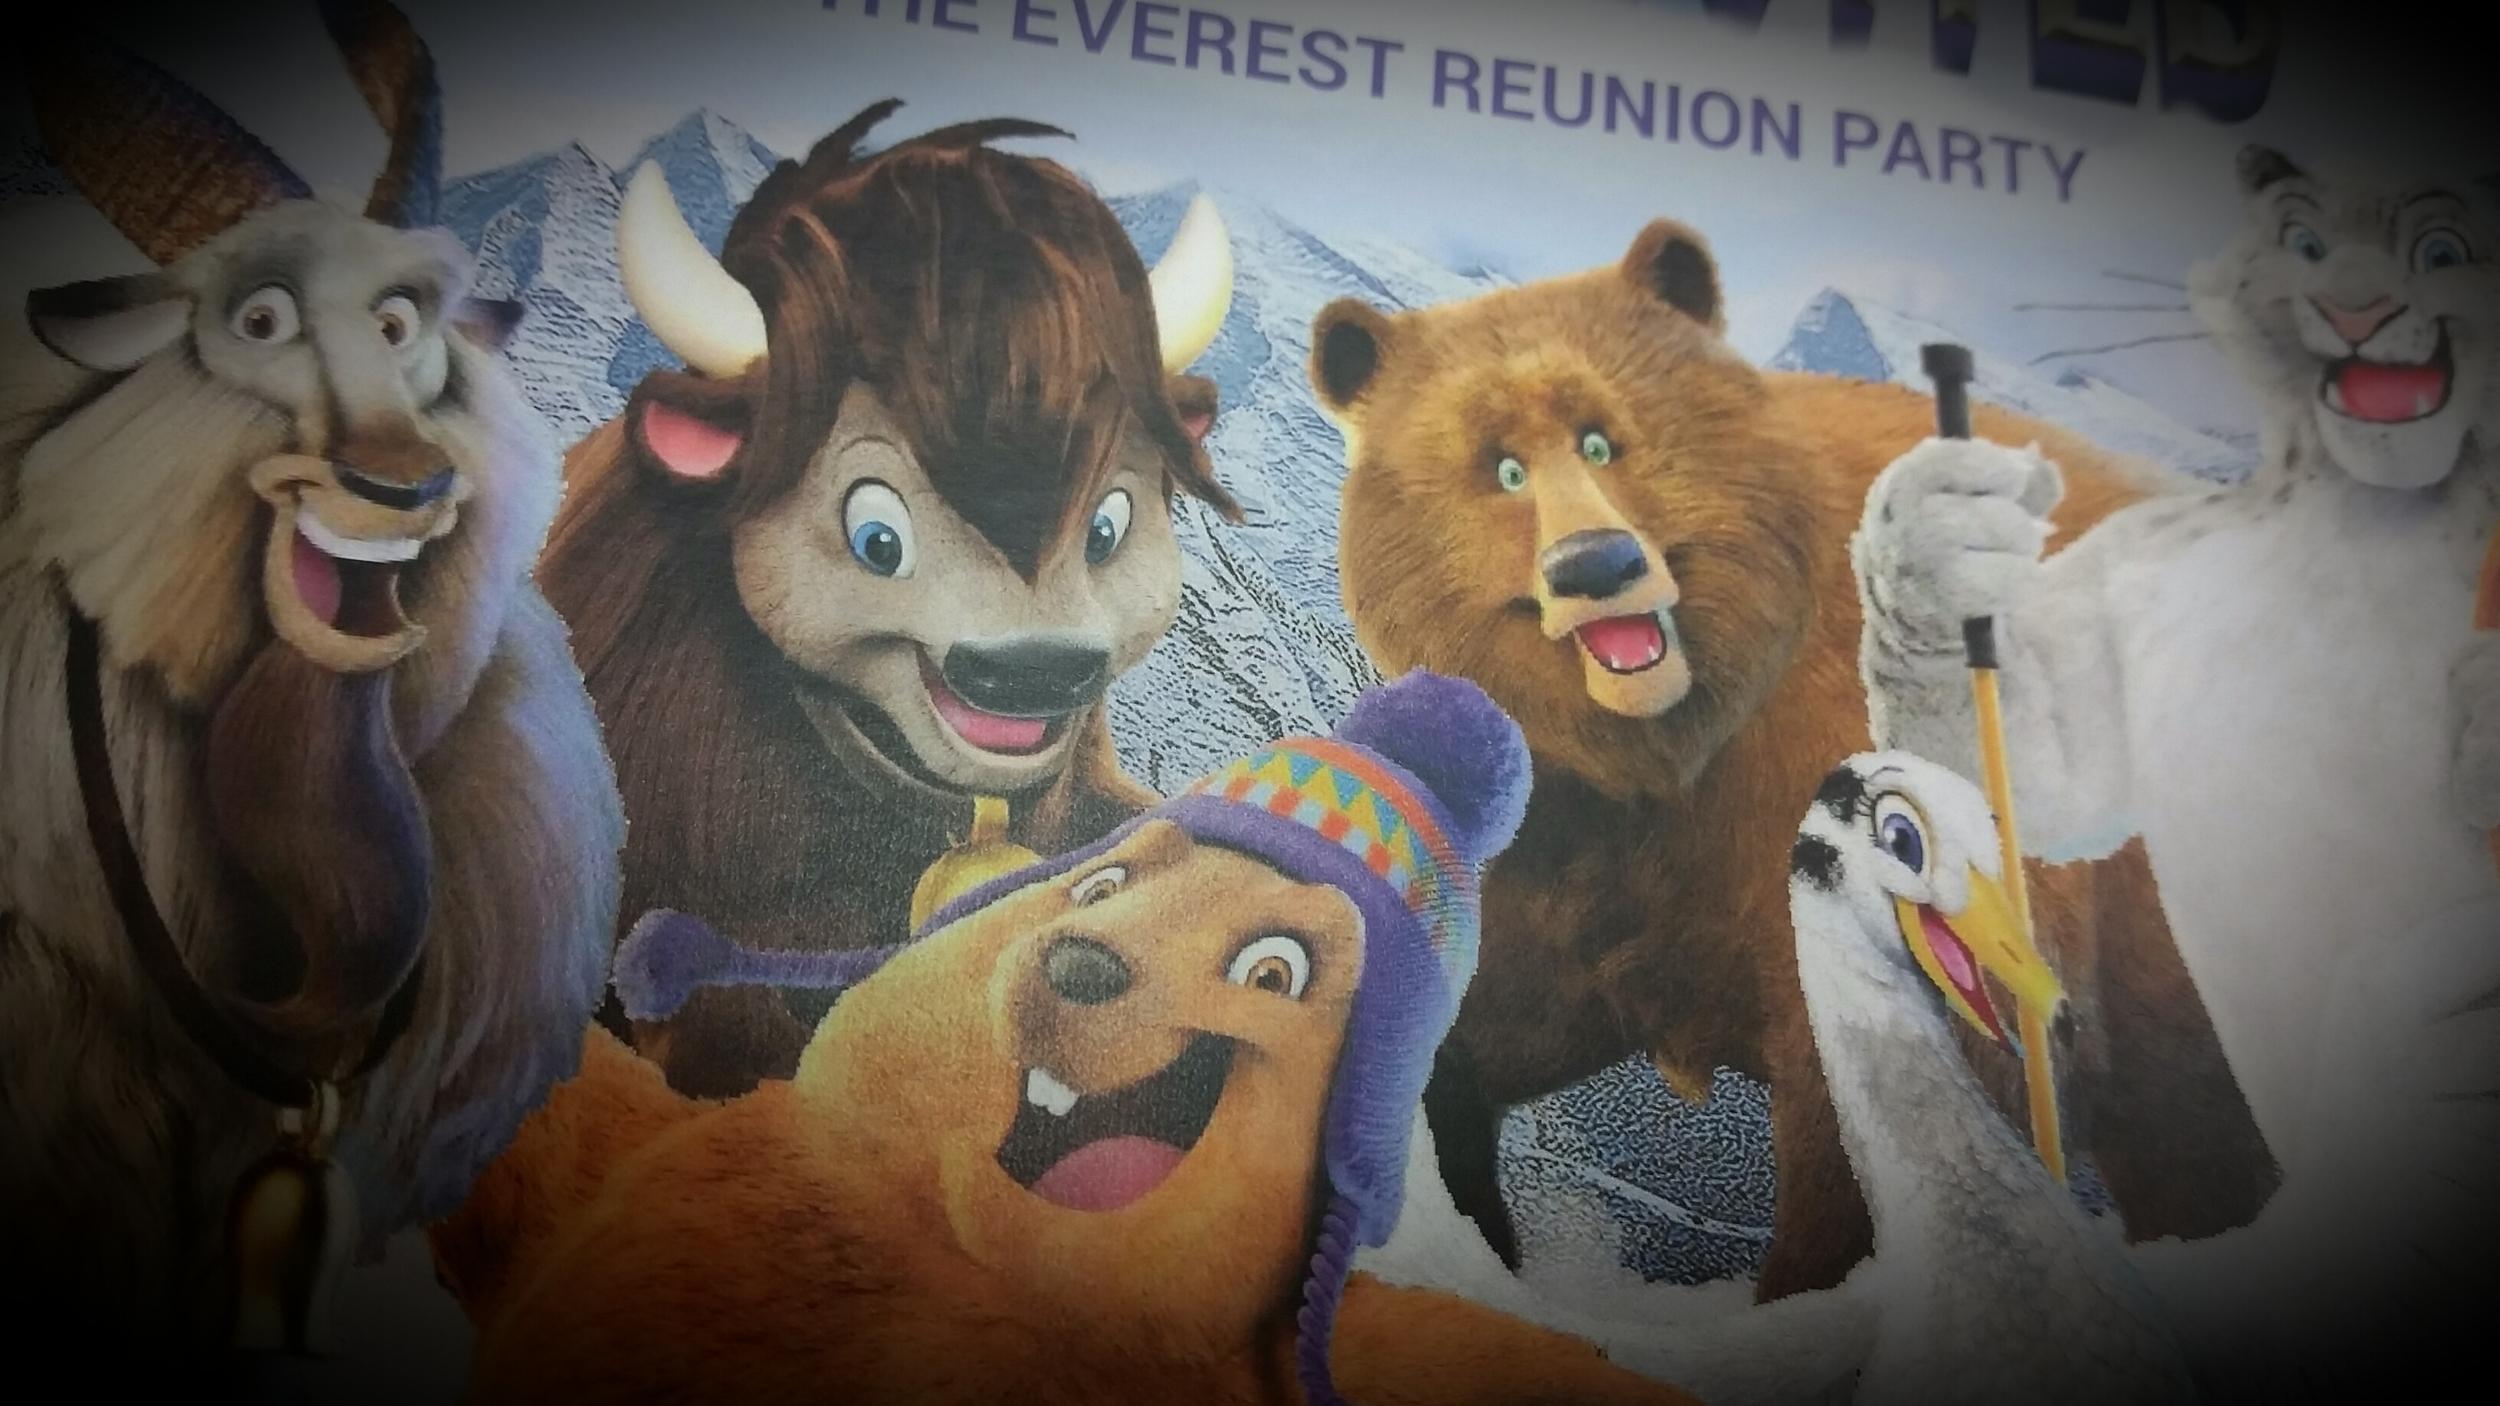 Everest Reunion Party Last Sunday